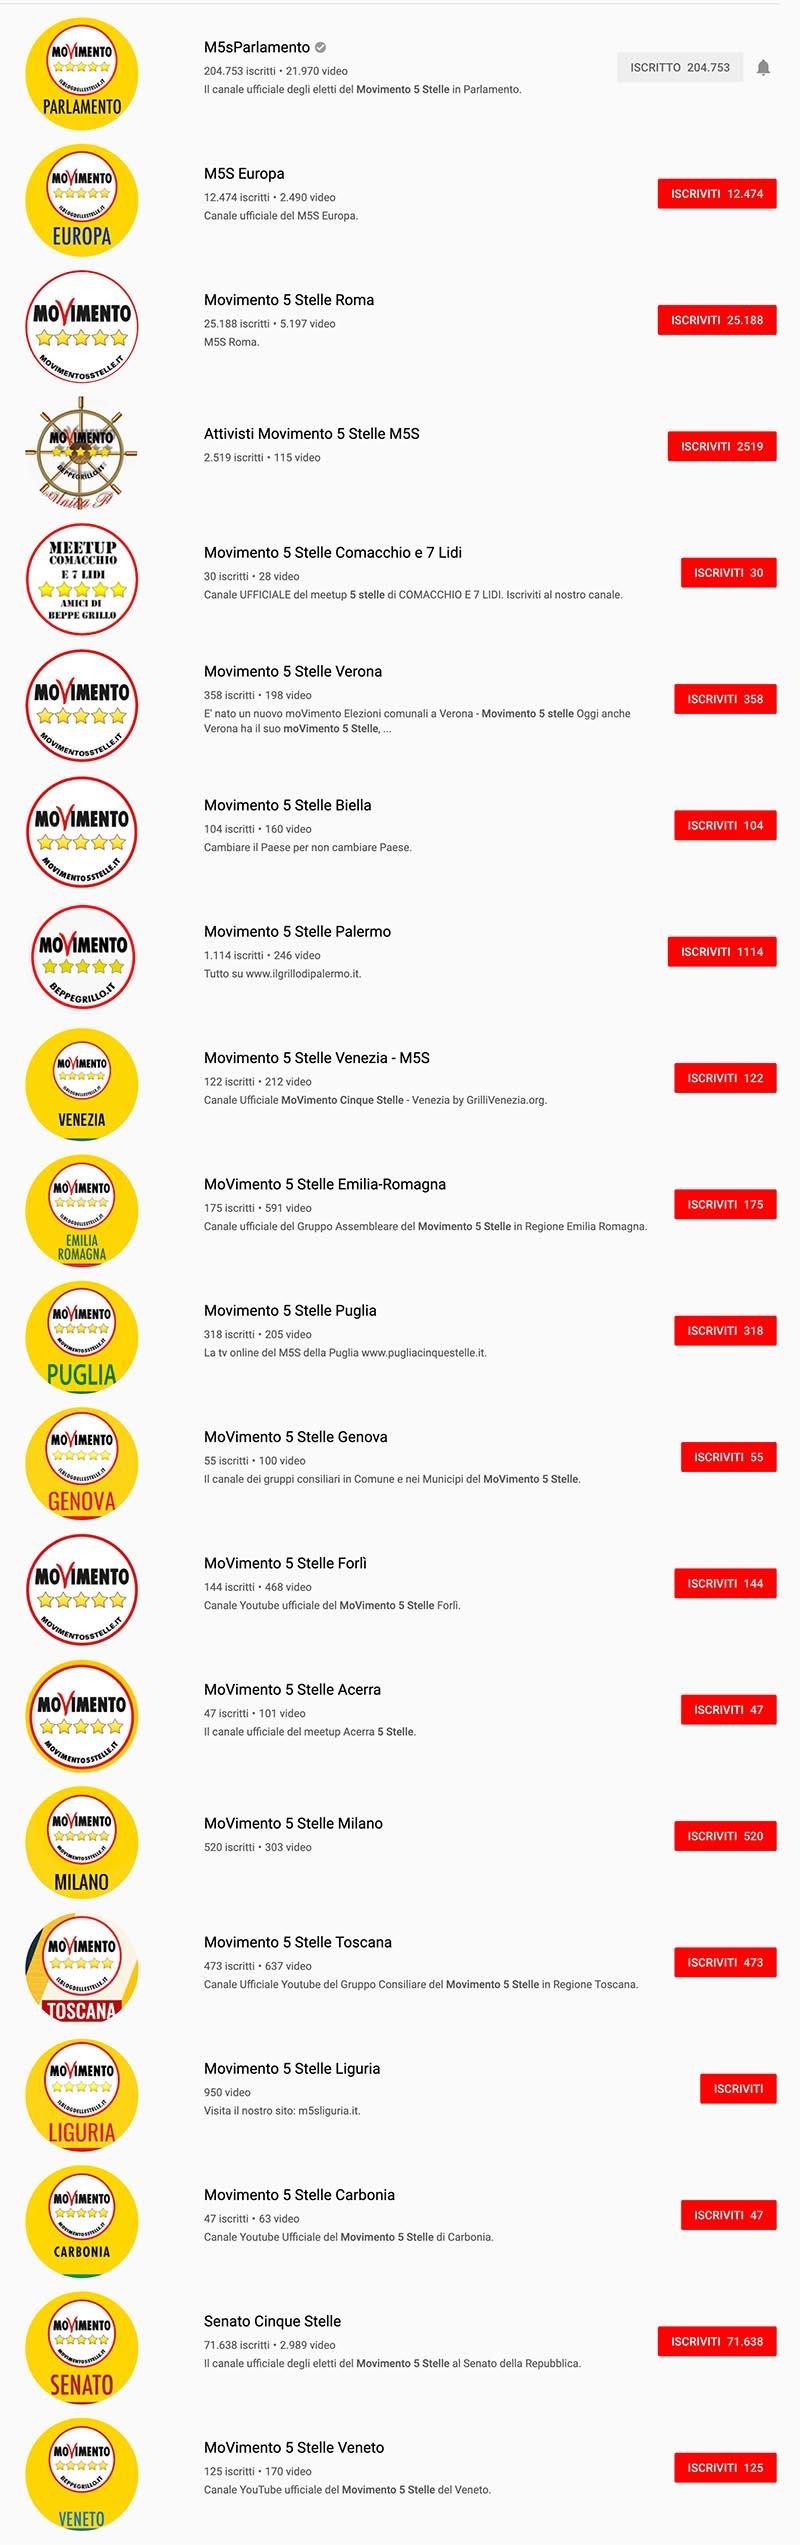 profili youtube movimento 5 stelle